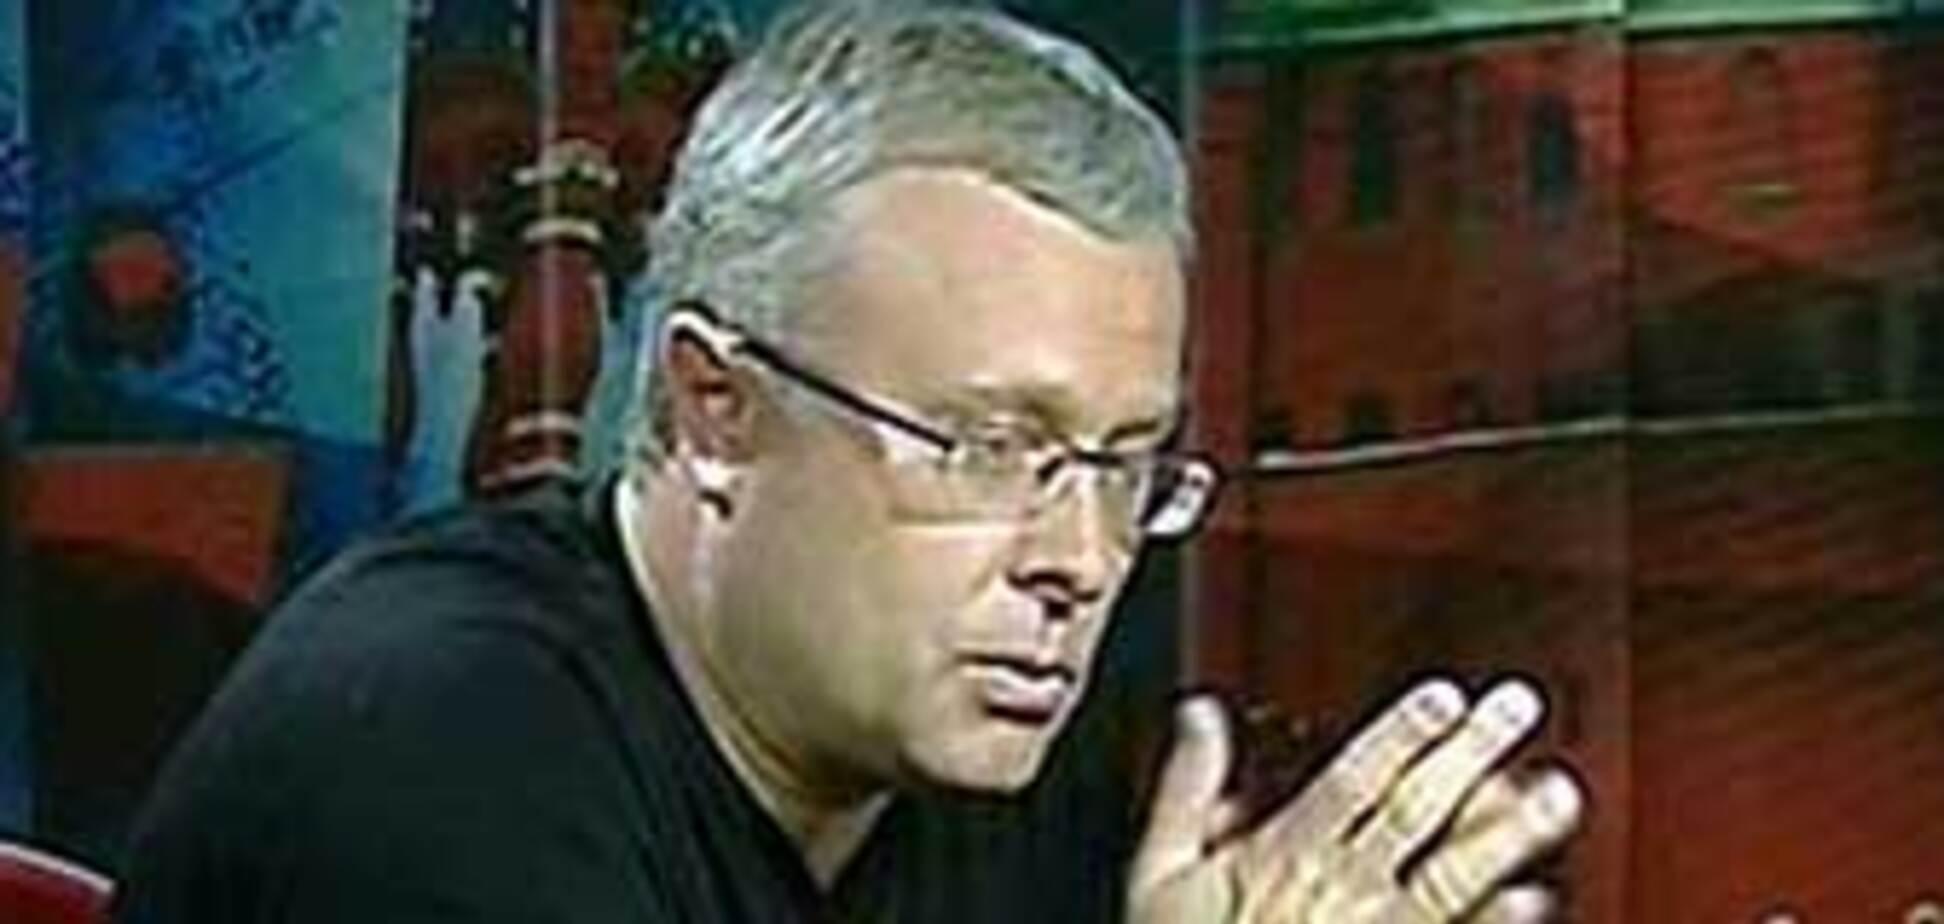 Депутат Держдуми заплатив 30 тисяч за свою посаду в LiveJournal